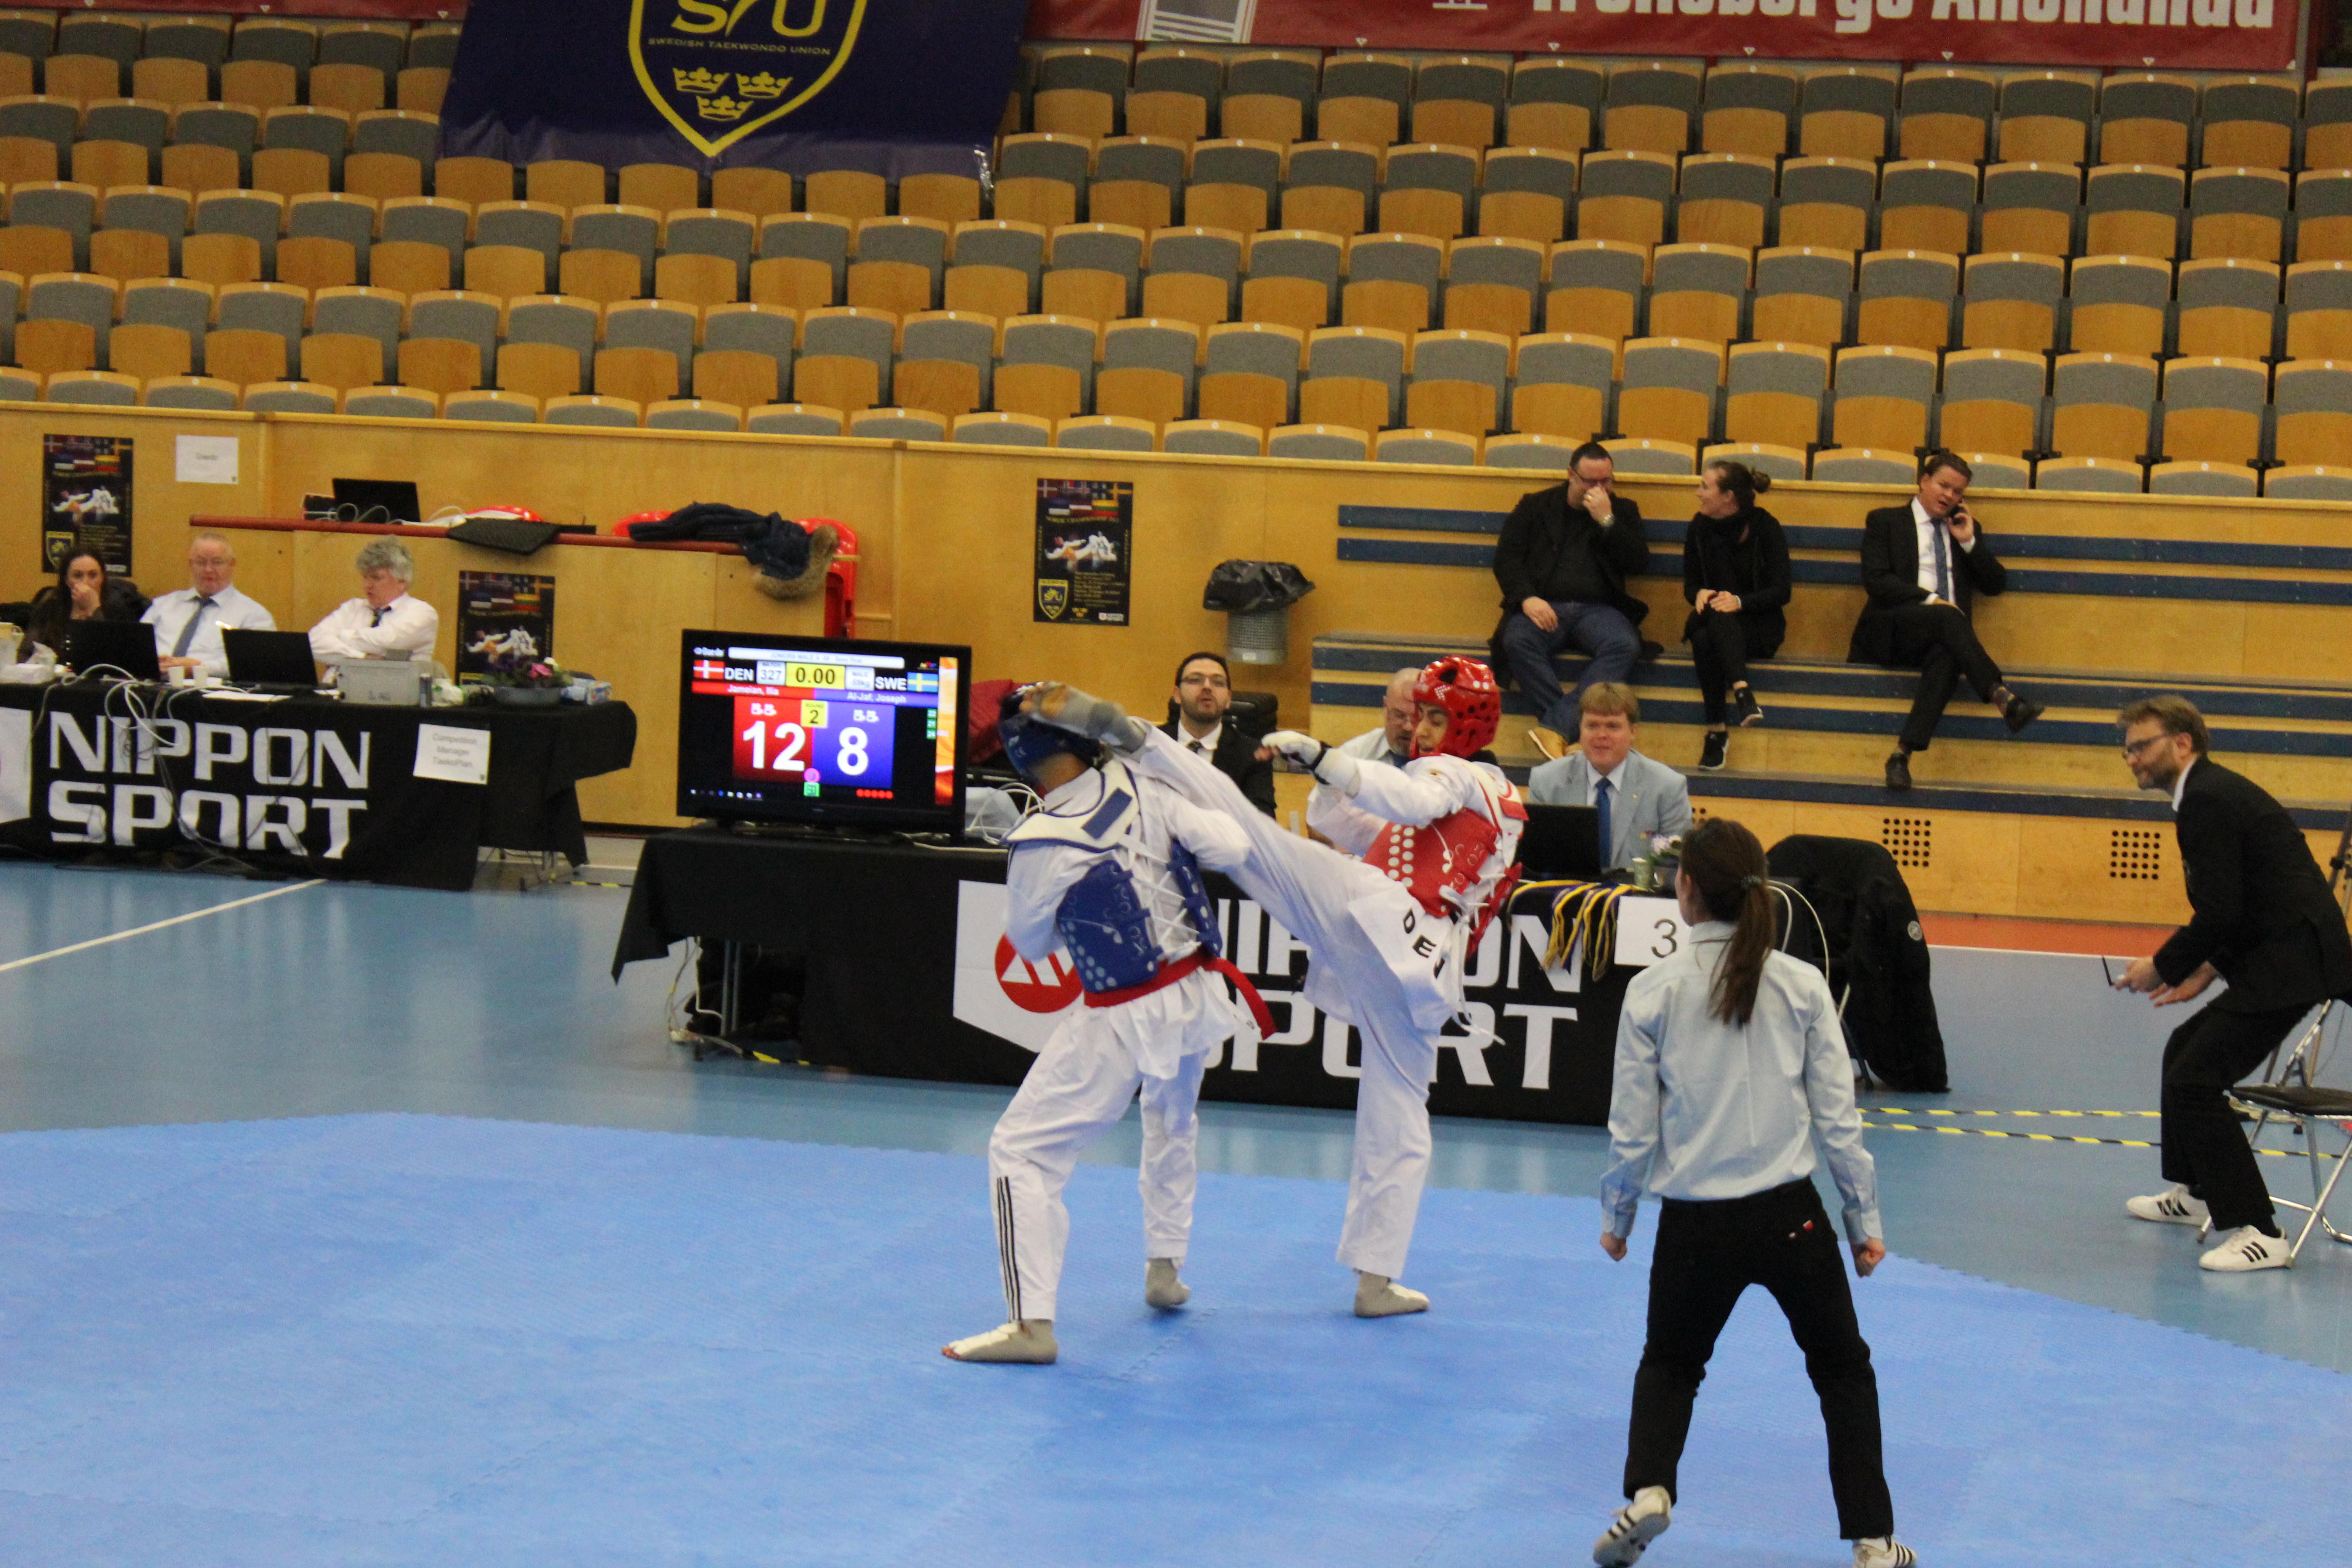 2017 Nordic championship